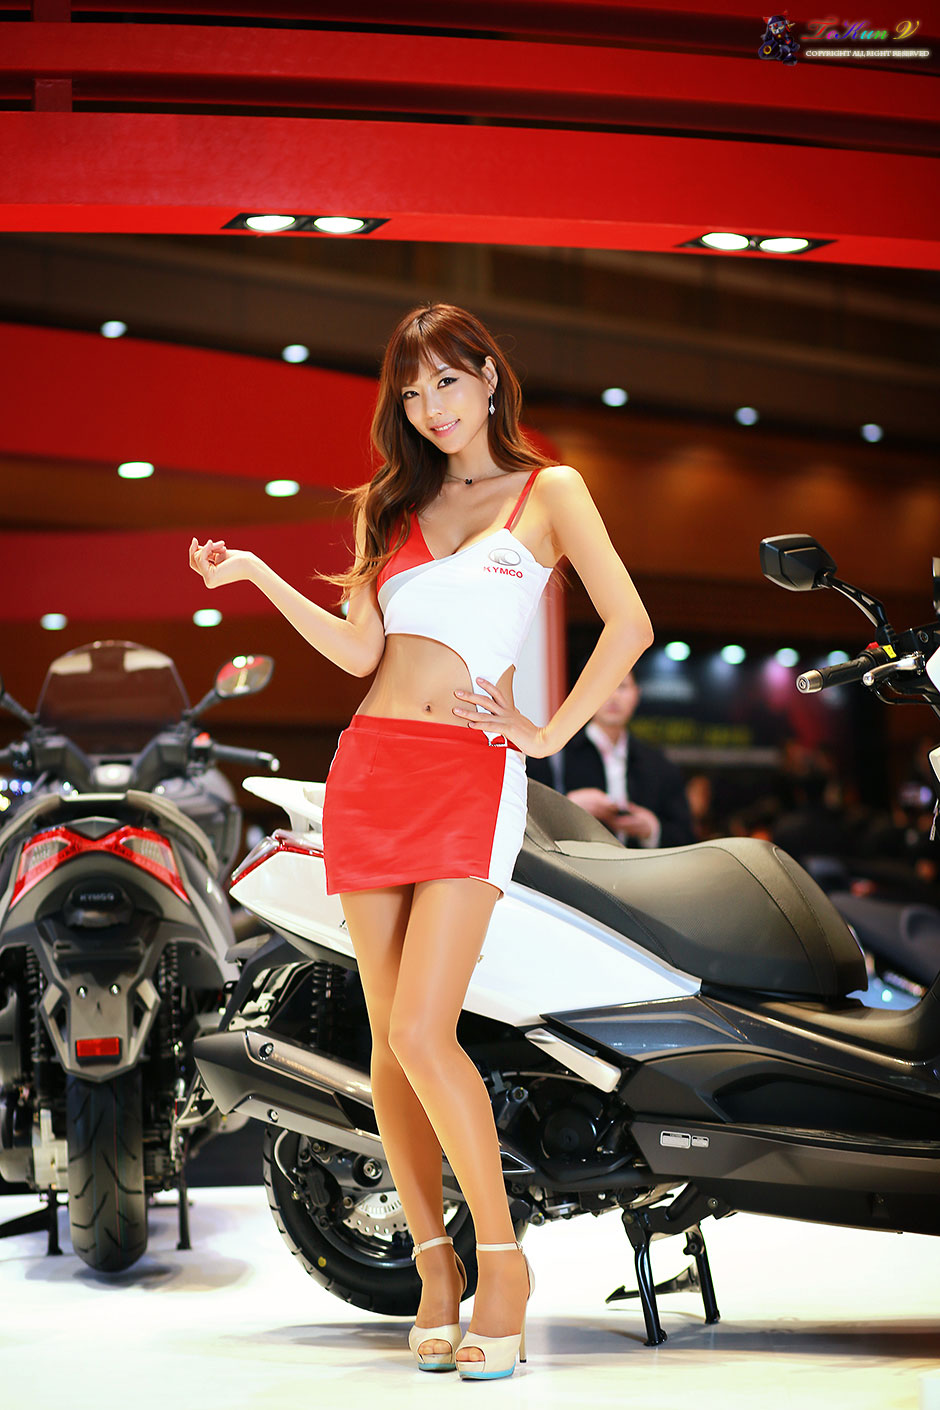 Kang I Na Seoul Motorcycle Show 2015 KYMCO